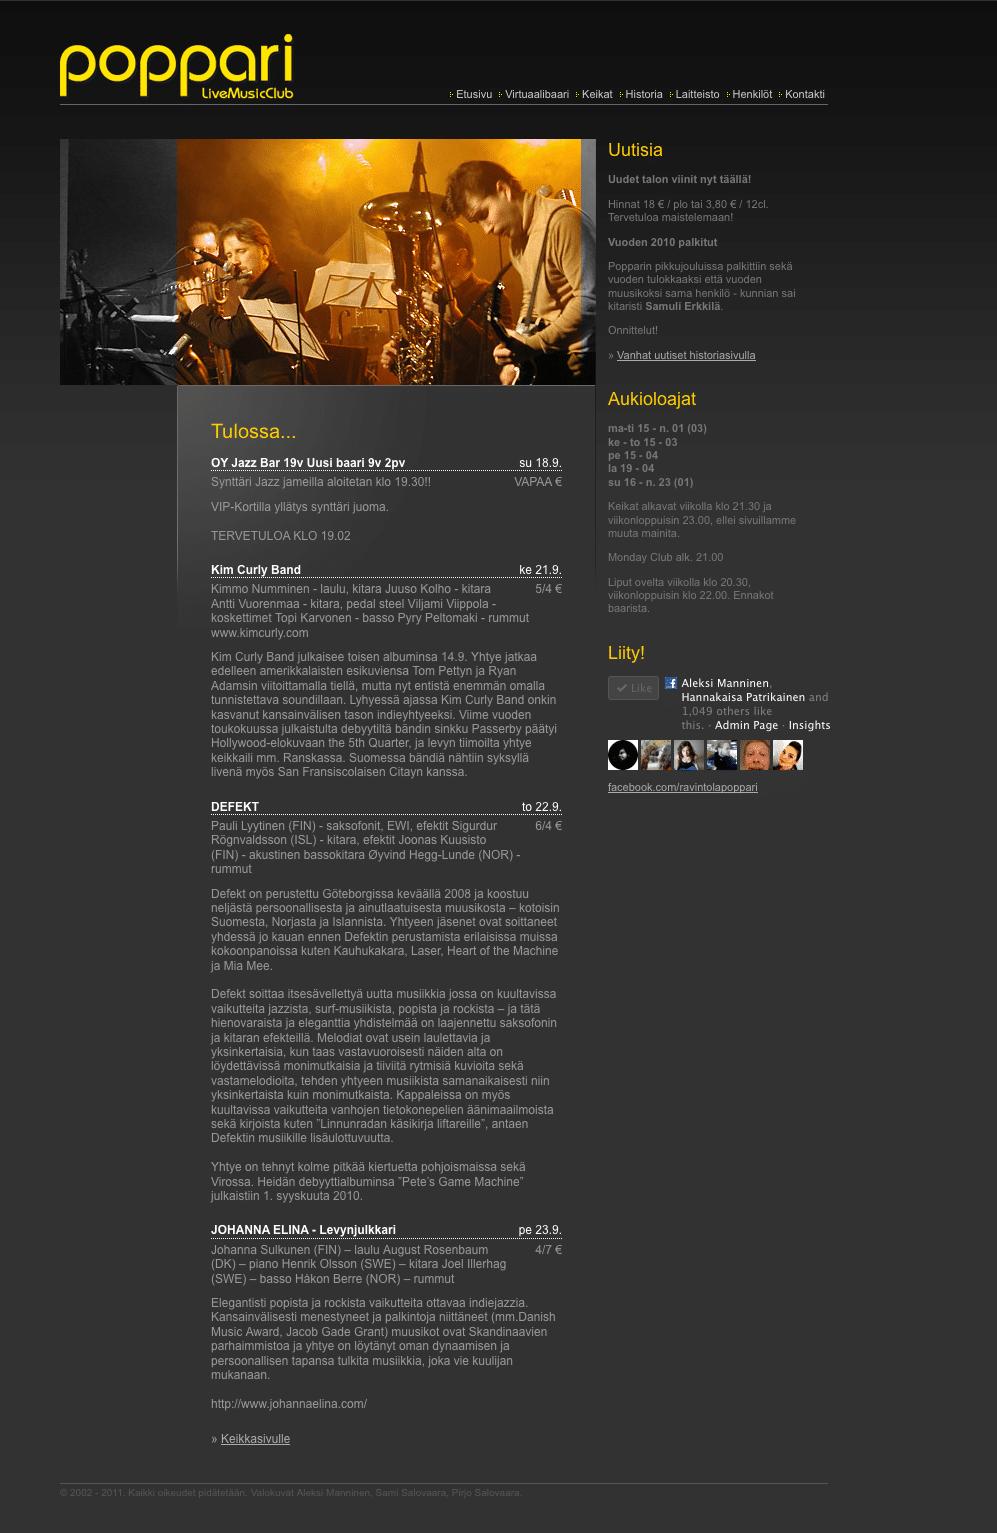 Poppari Live Music Club